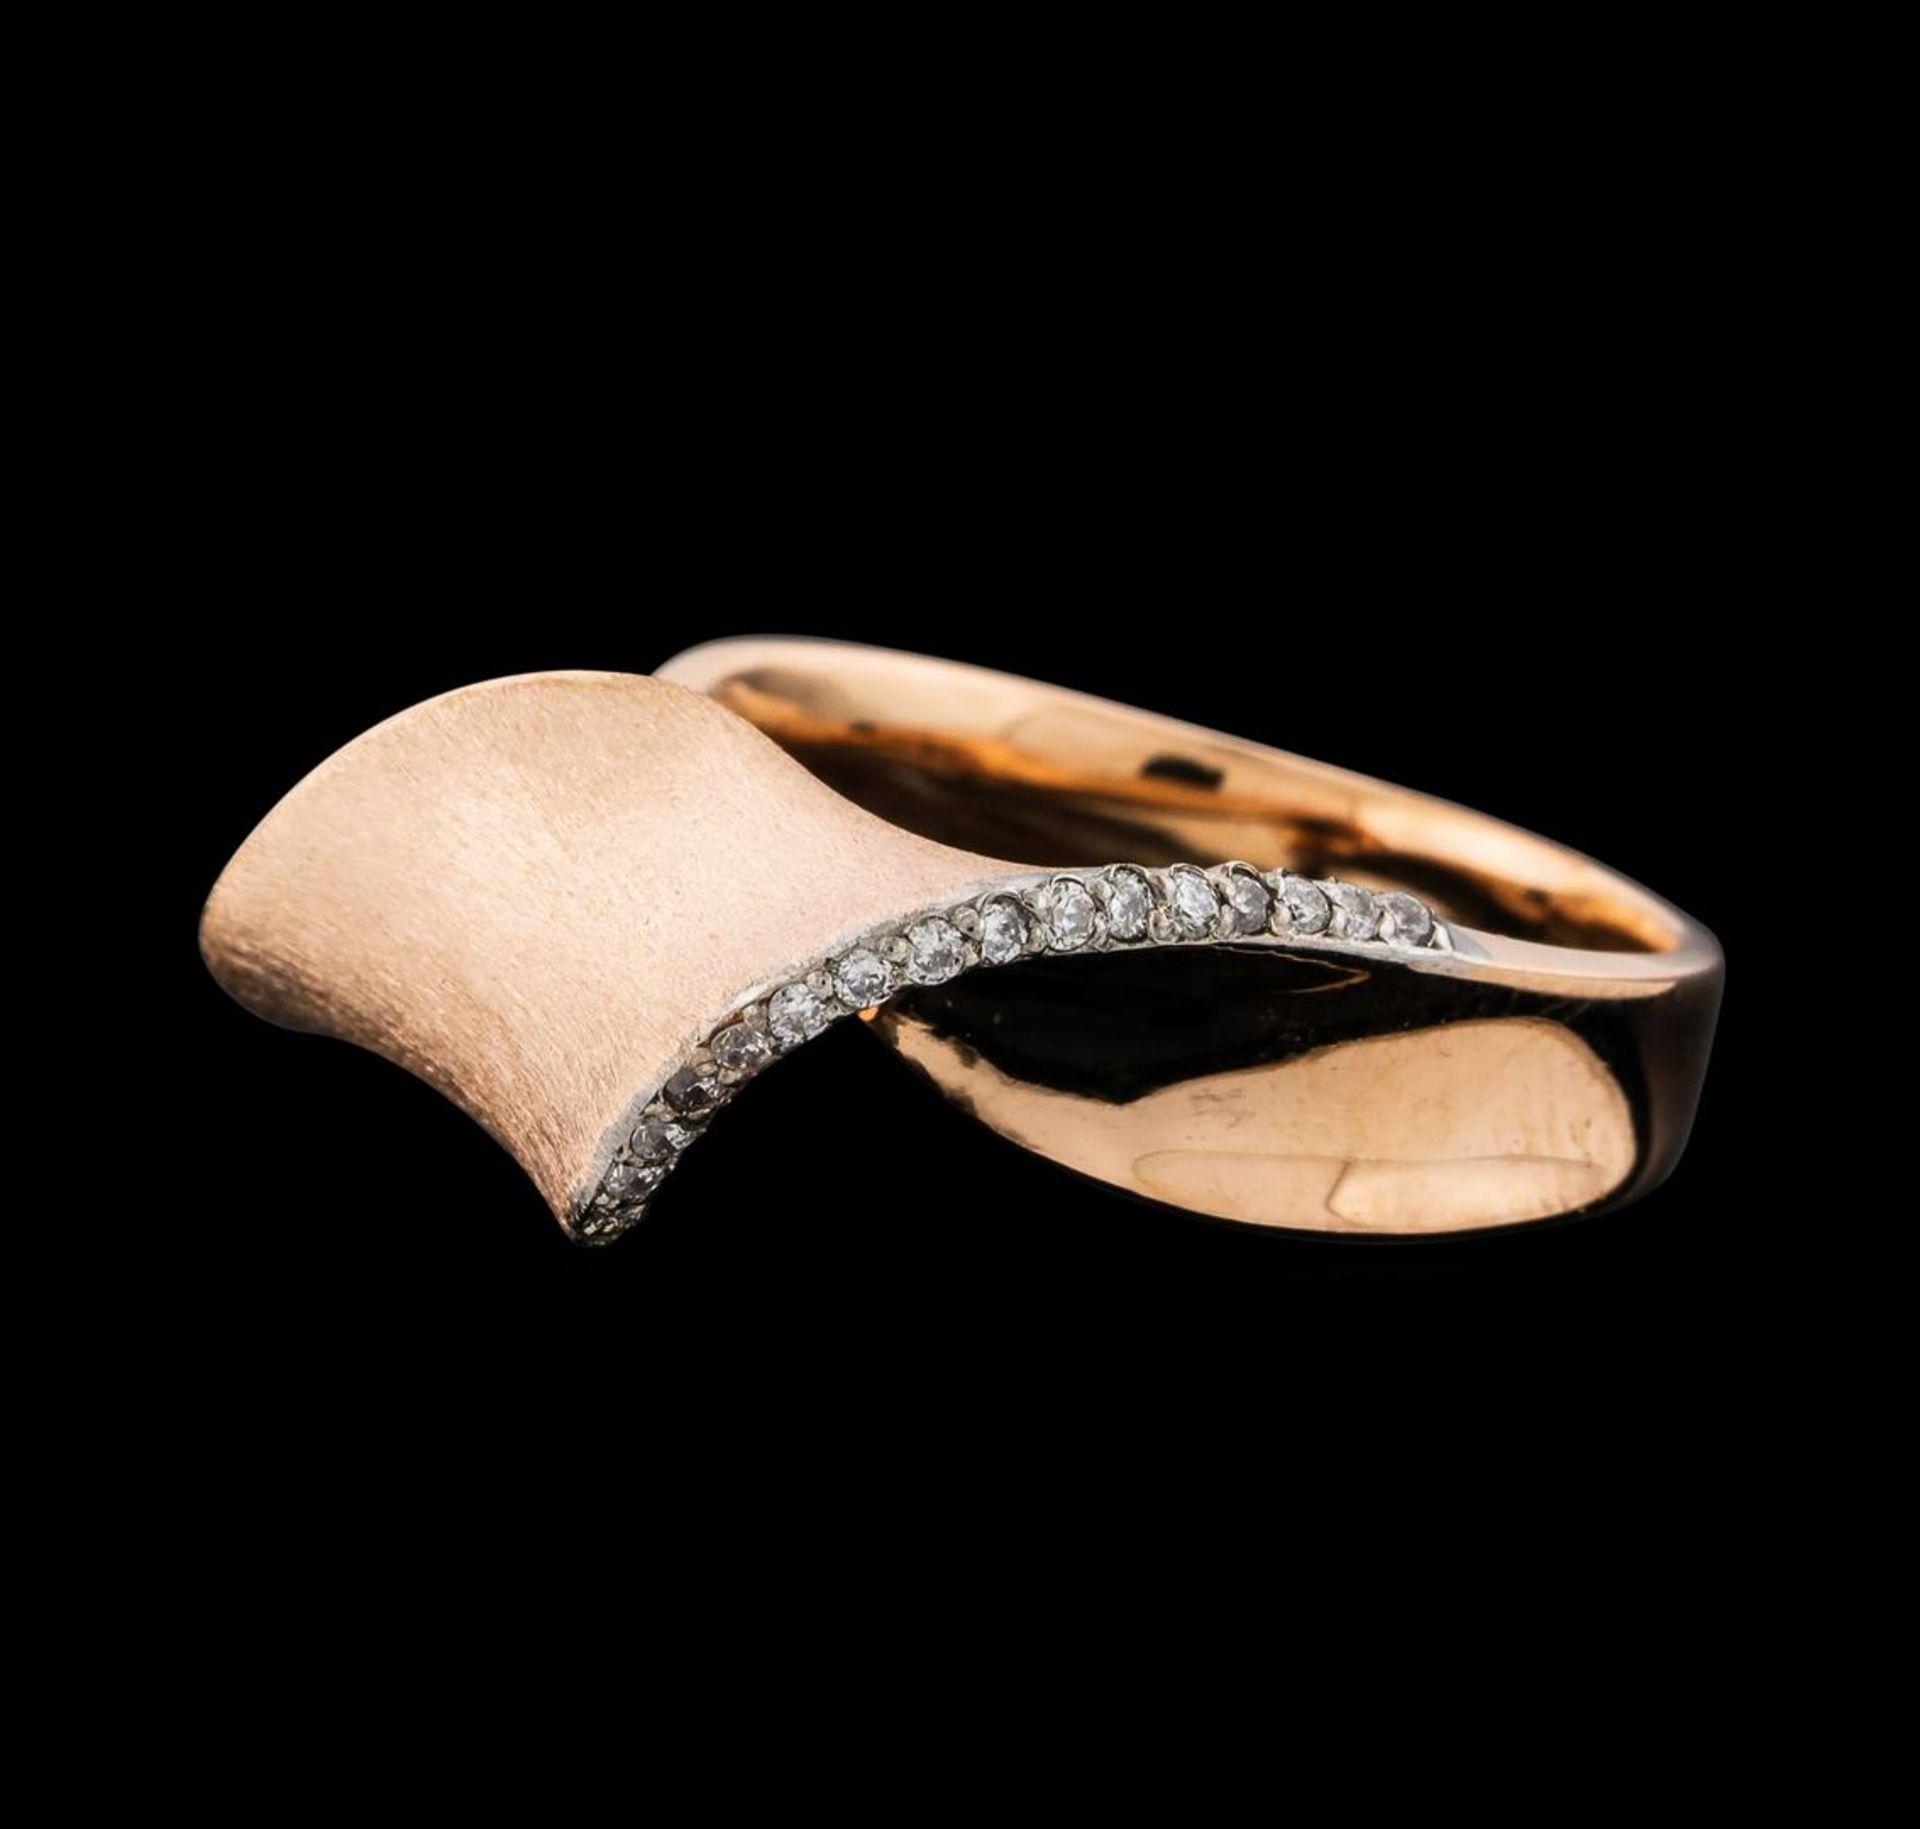 0.15 ctw Diamond Ring - 14KT Rose Gold